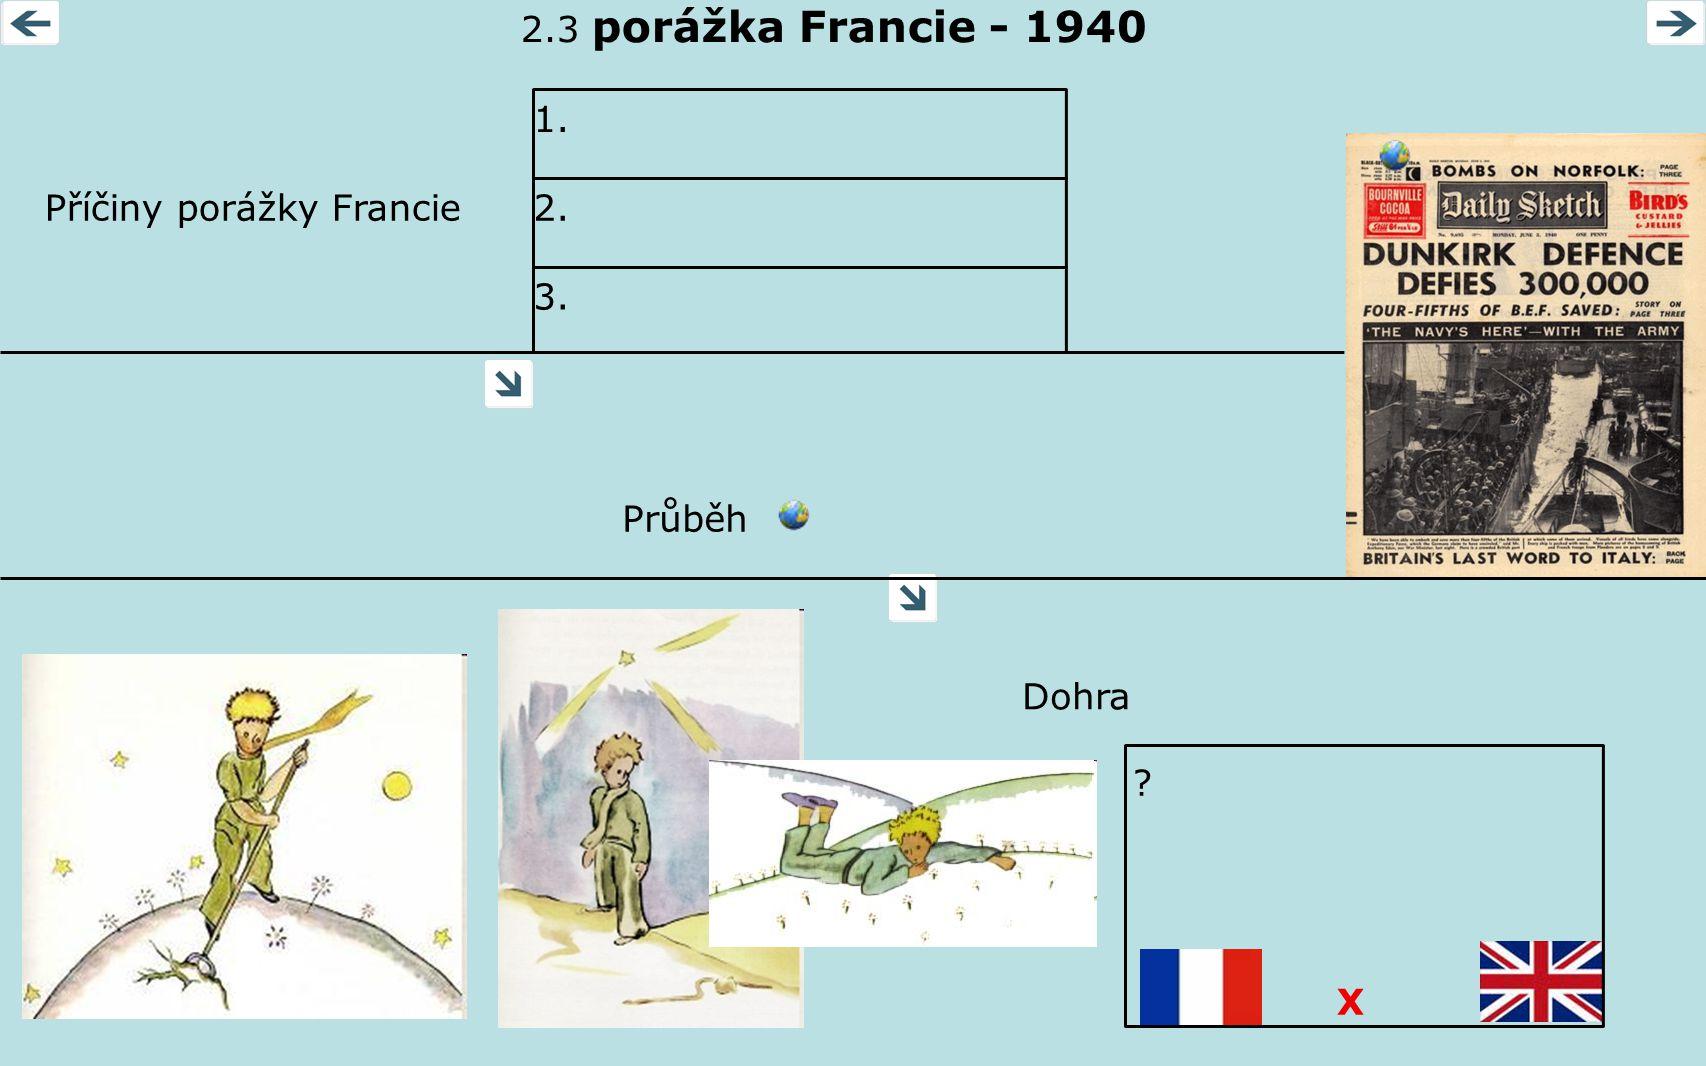 Příčiny porážky Francie 2.3 porážka Francie - 1940 Průběh Dohra 1. 2. 3. ? X